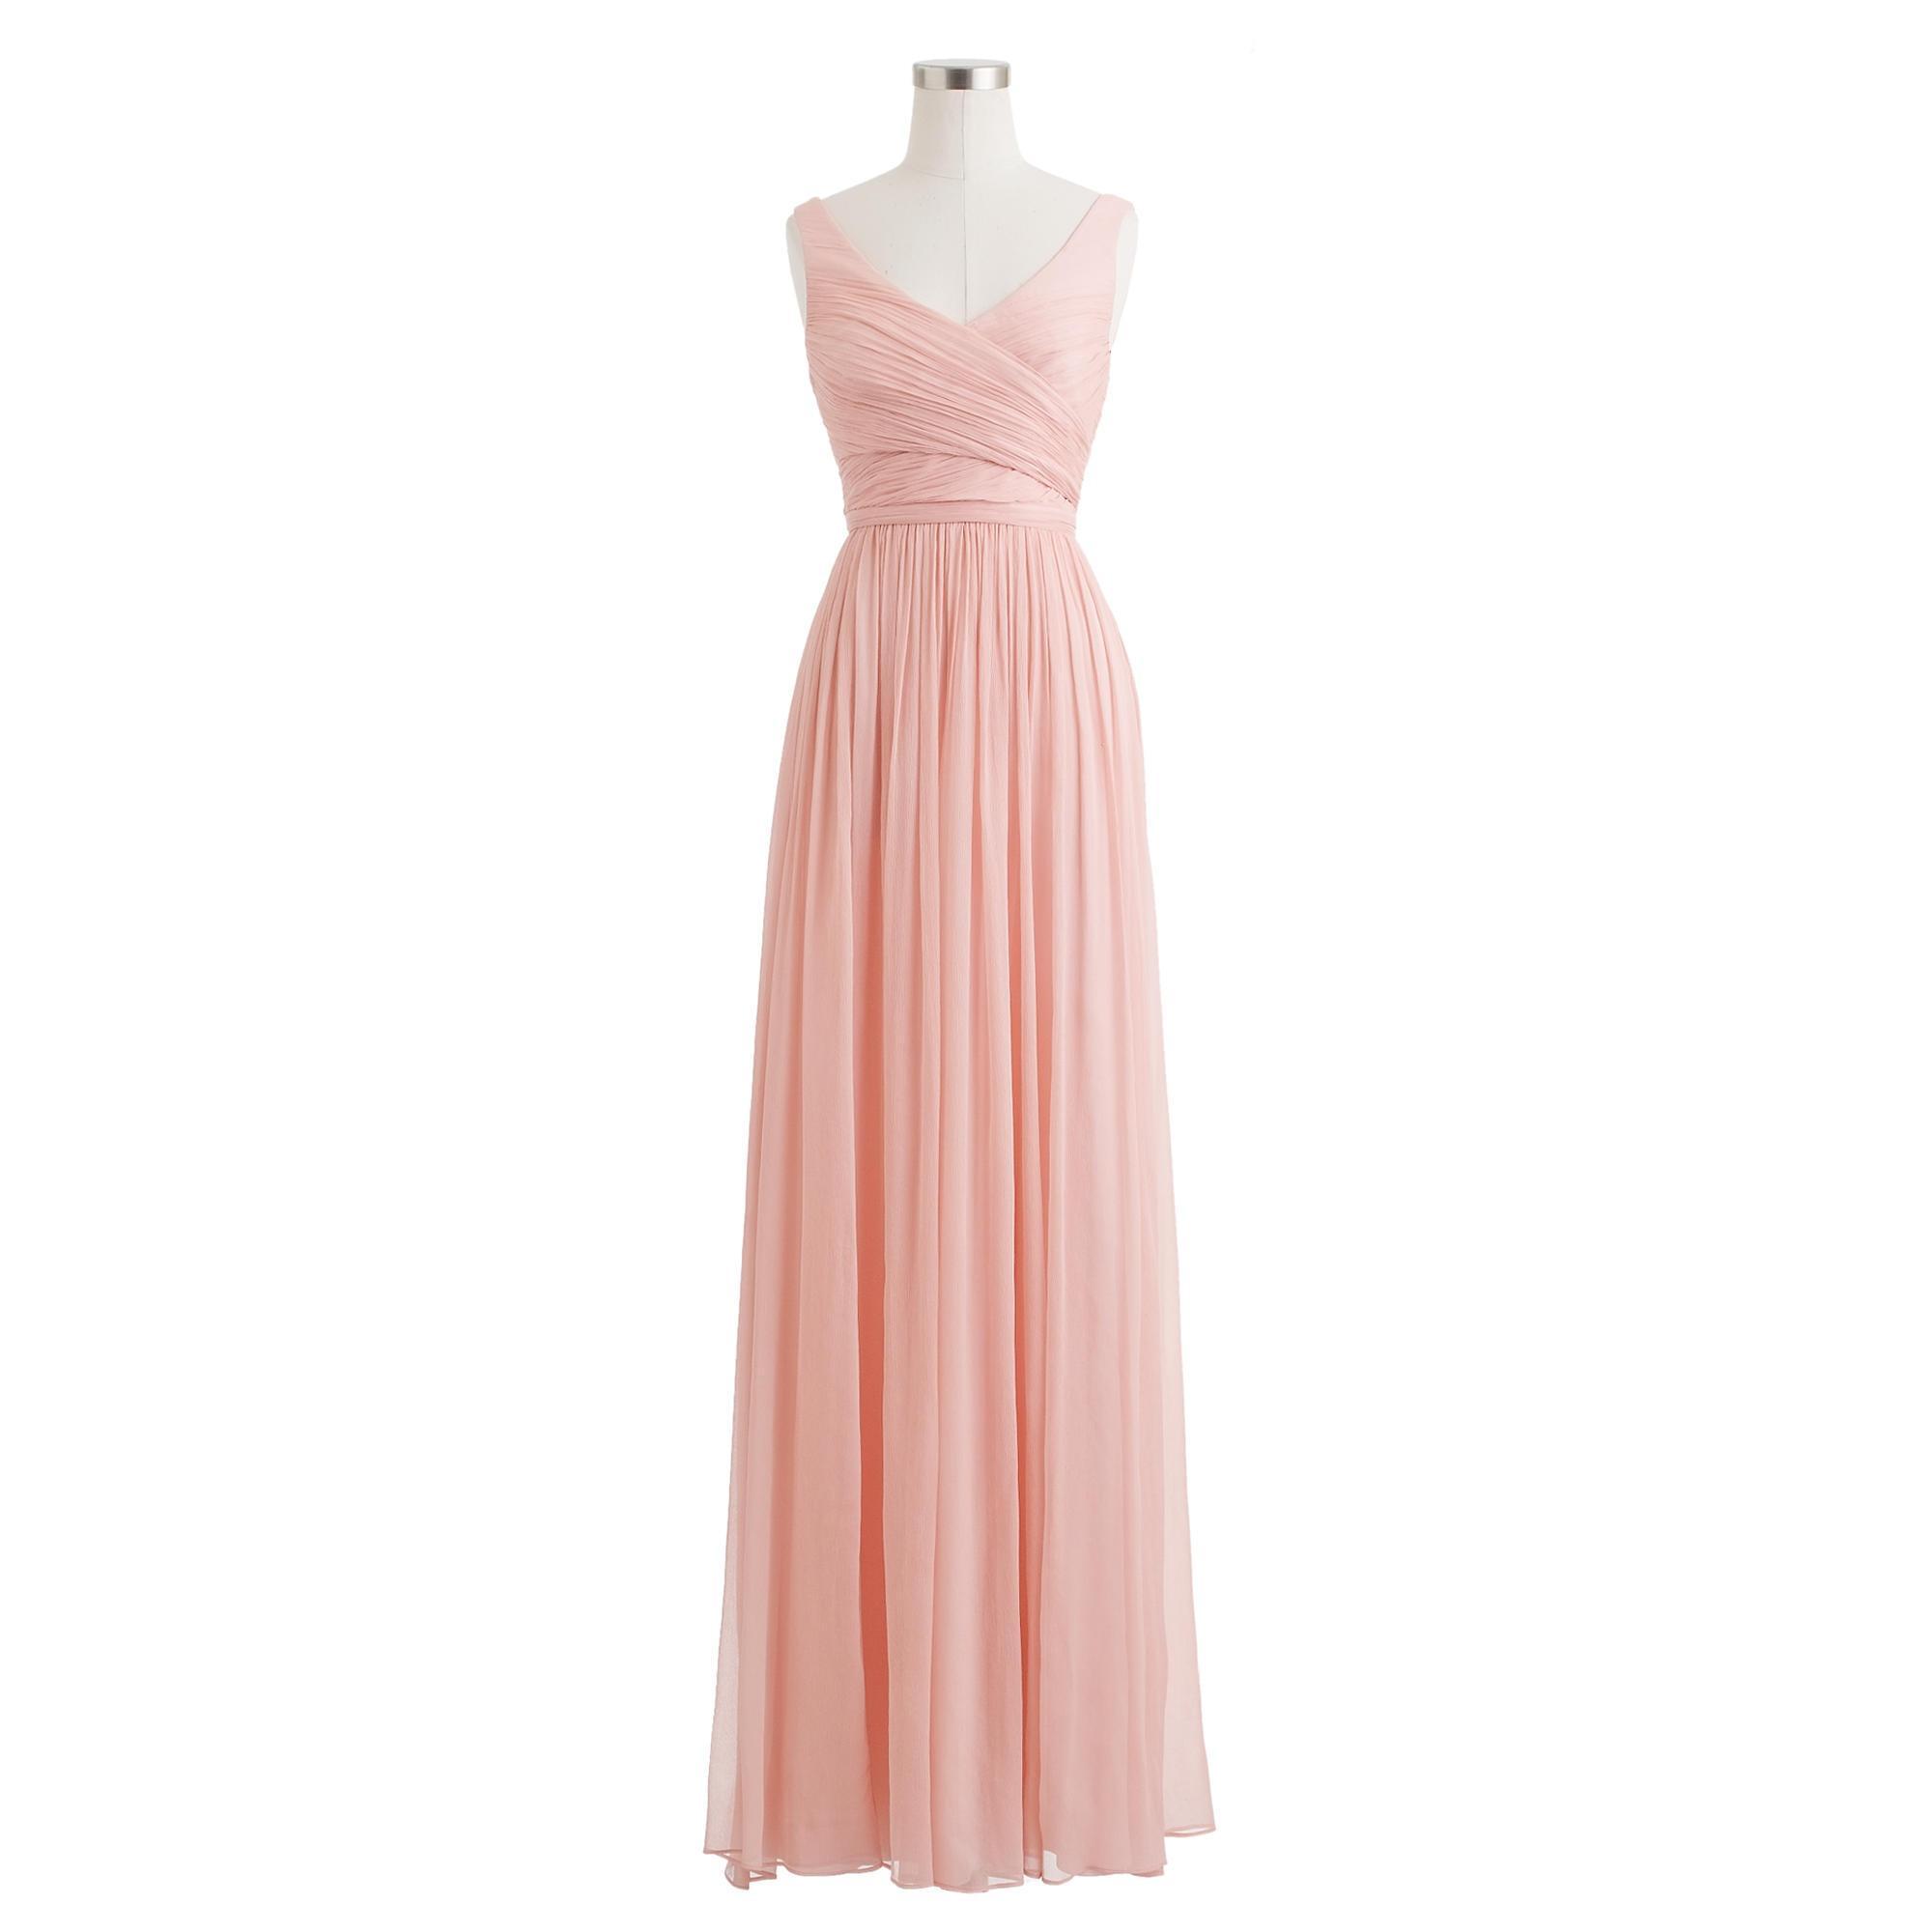 Lyst - J.Crew Heidi Long Dress In Silk Chiffon in Pink